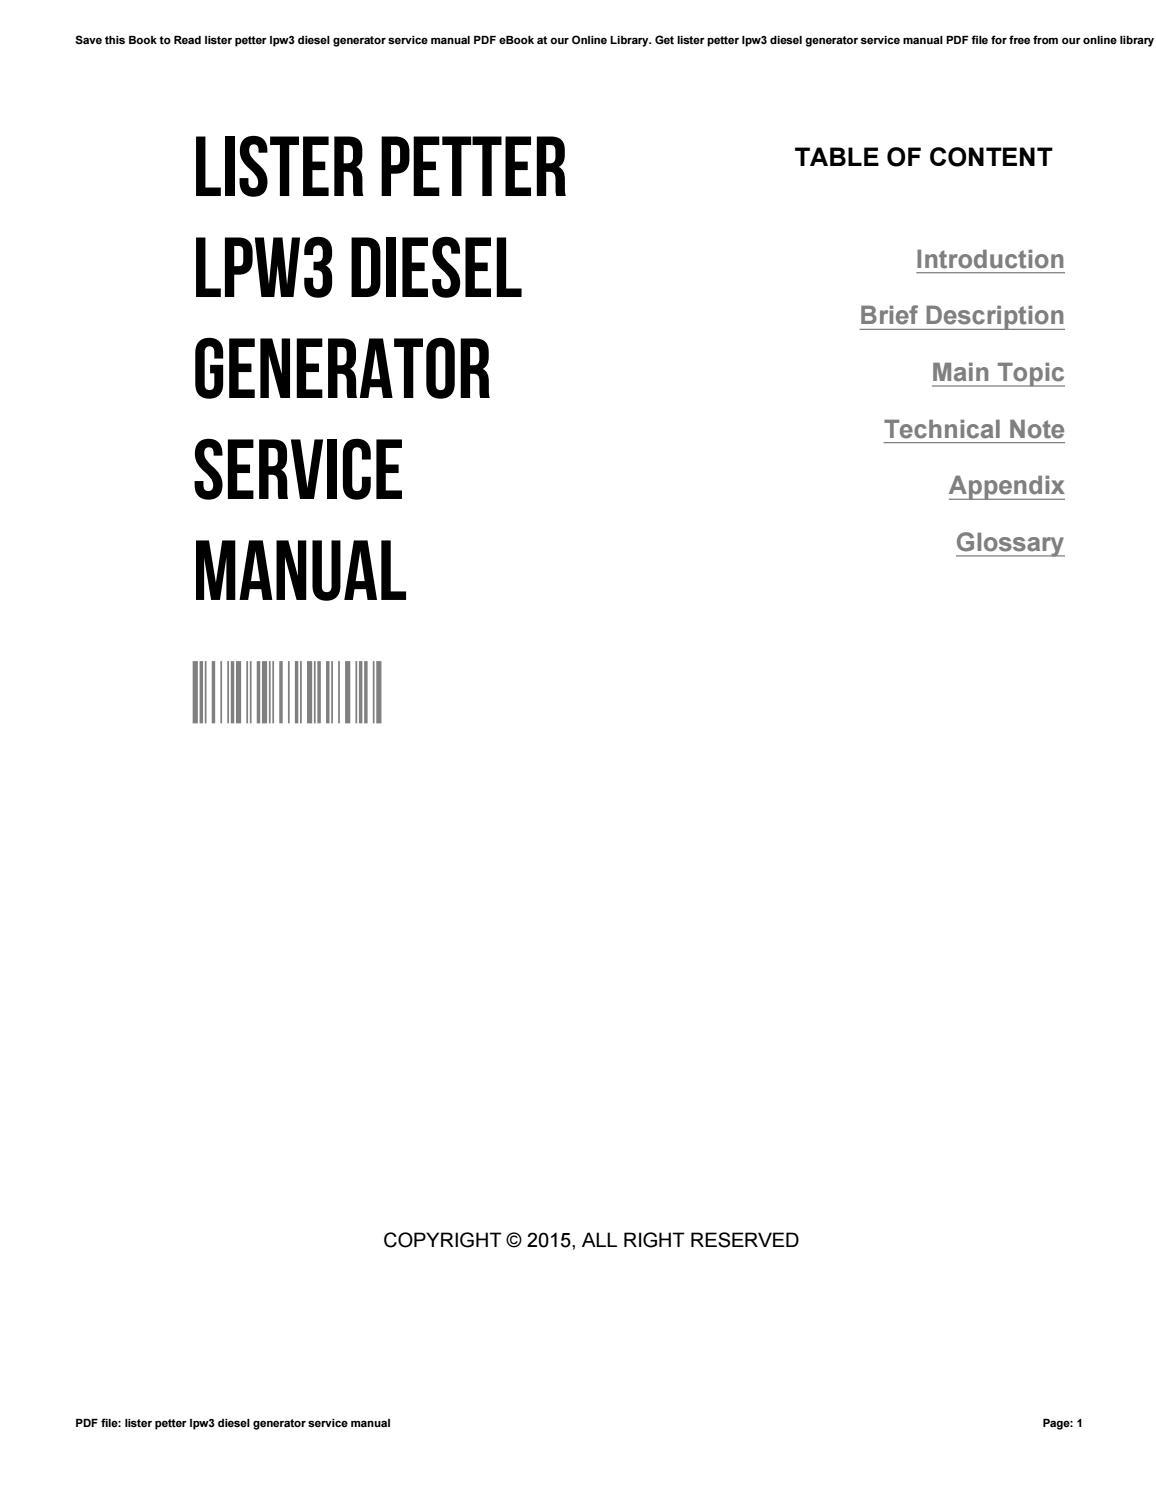 Lister petter lpw3 diesel generator service manual by IdaCornett2935 - issuu